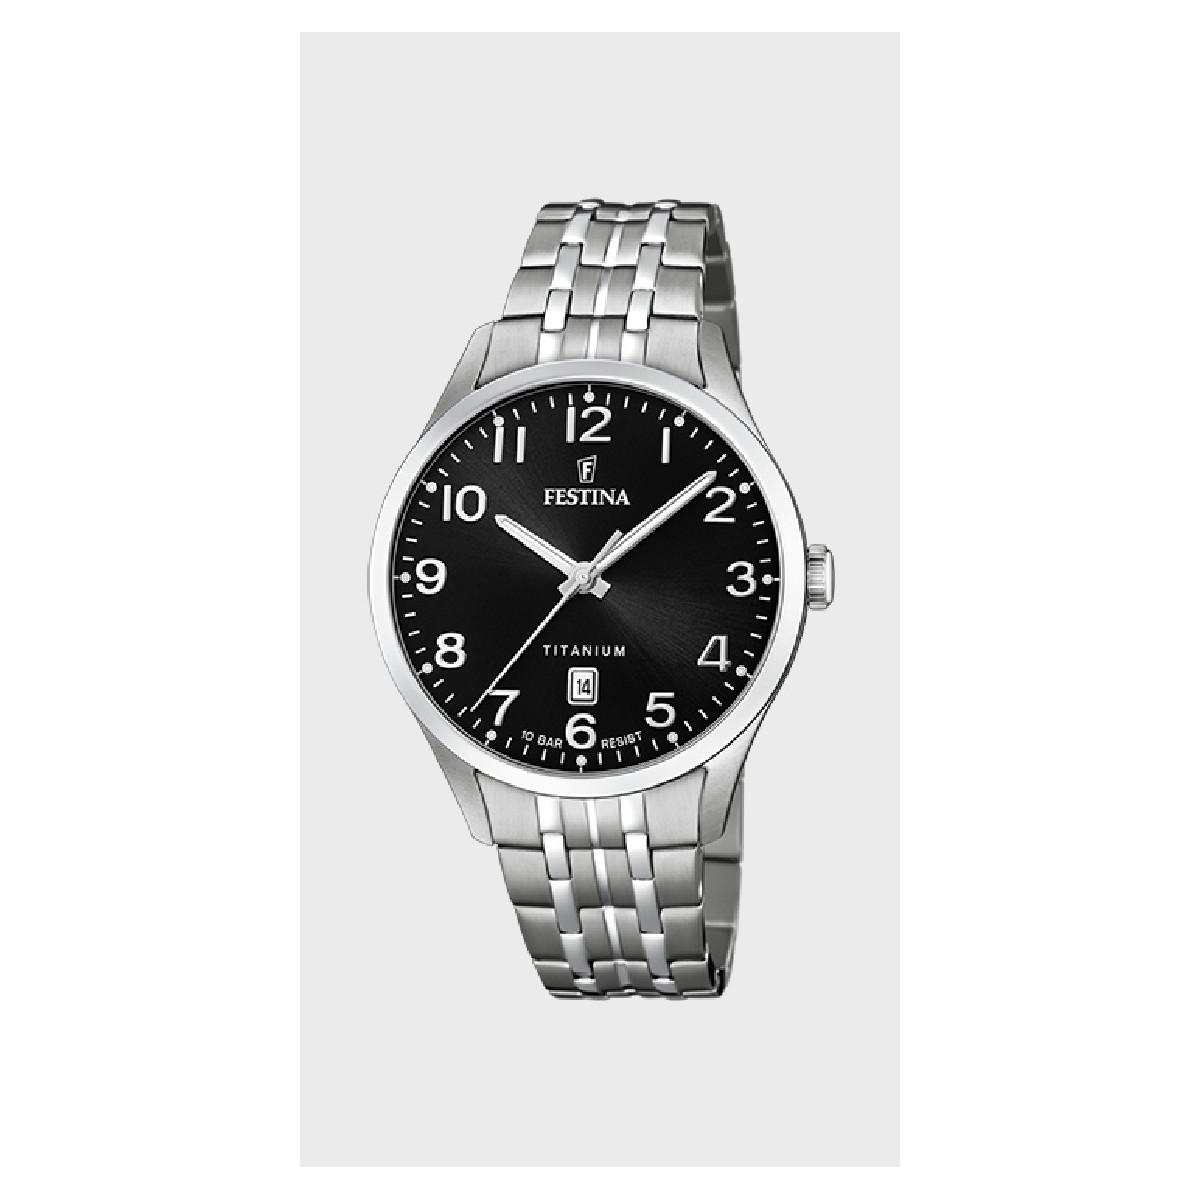 Reloj Festina - F20466-3